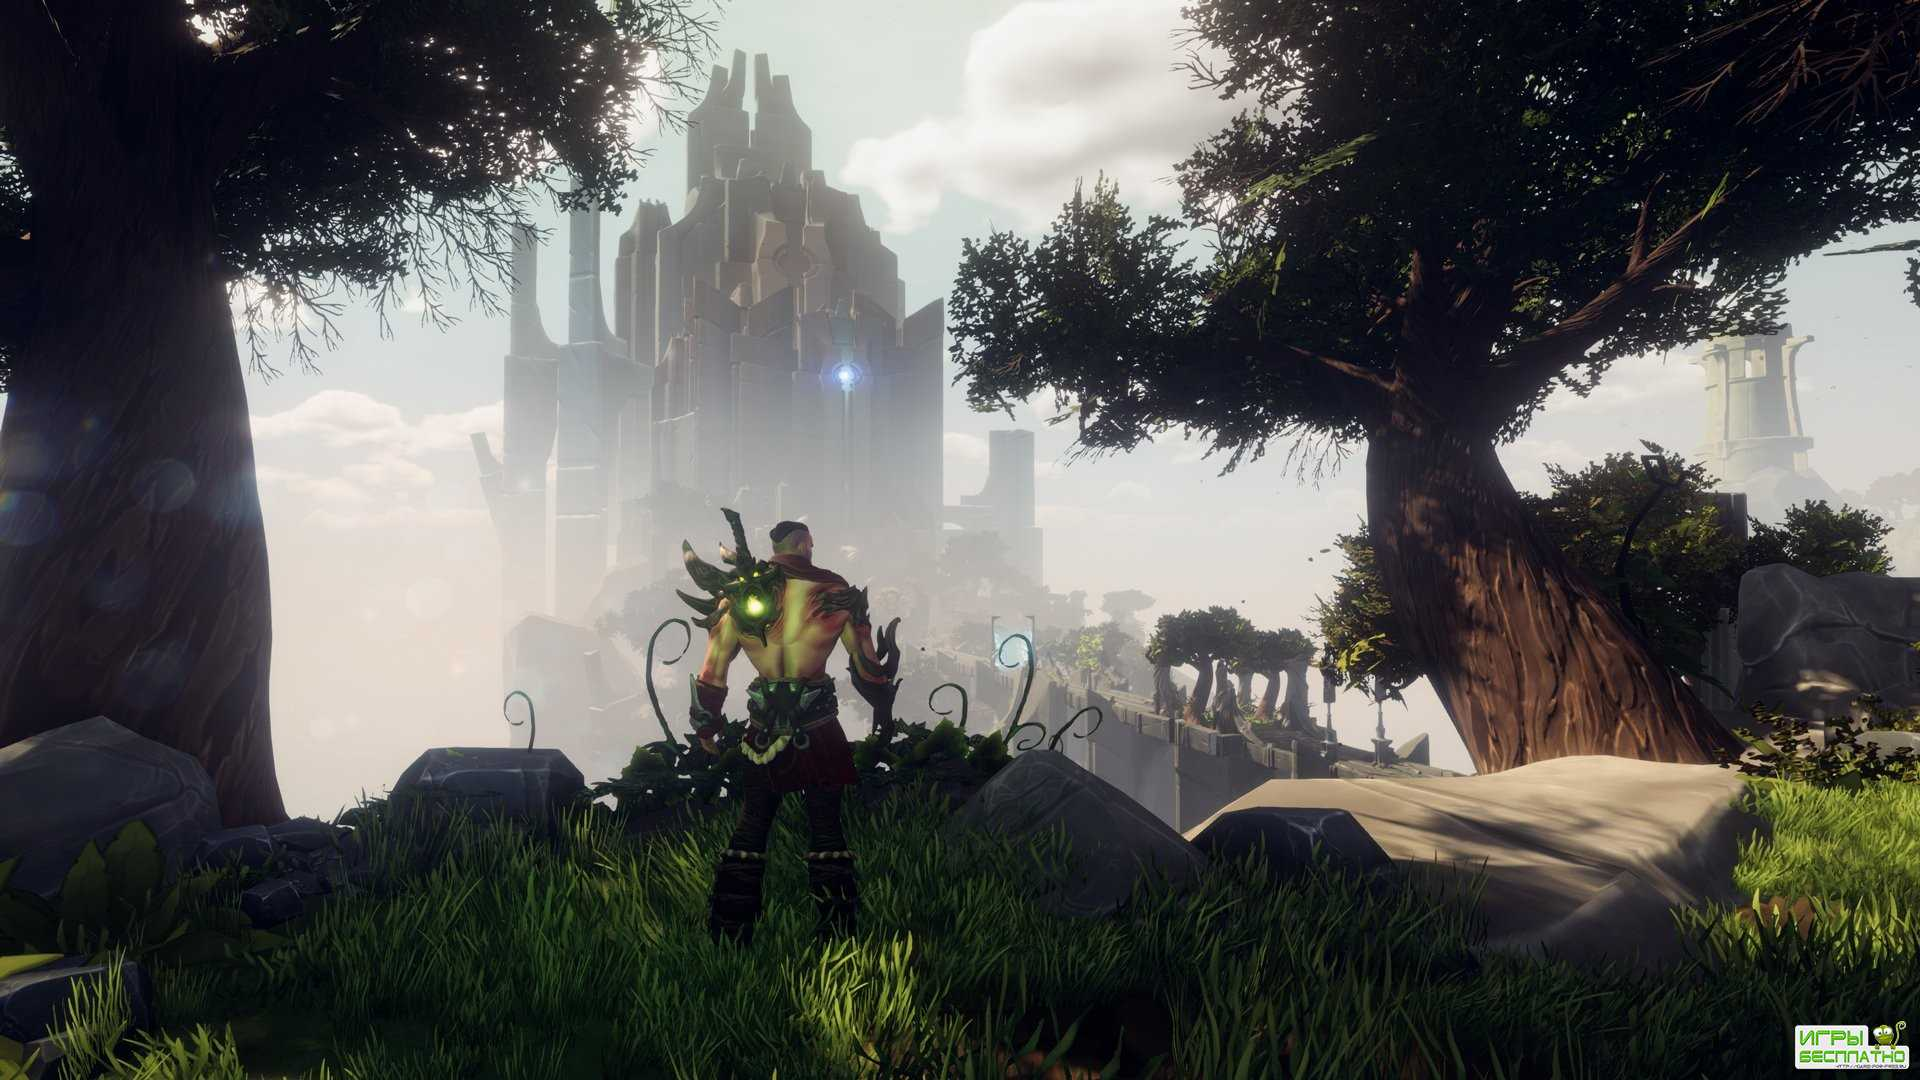 Jedi Knight встречает Metal Gear Rising: Revengeance в ролевой игре Warlander